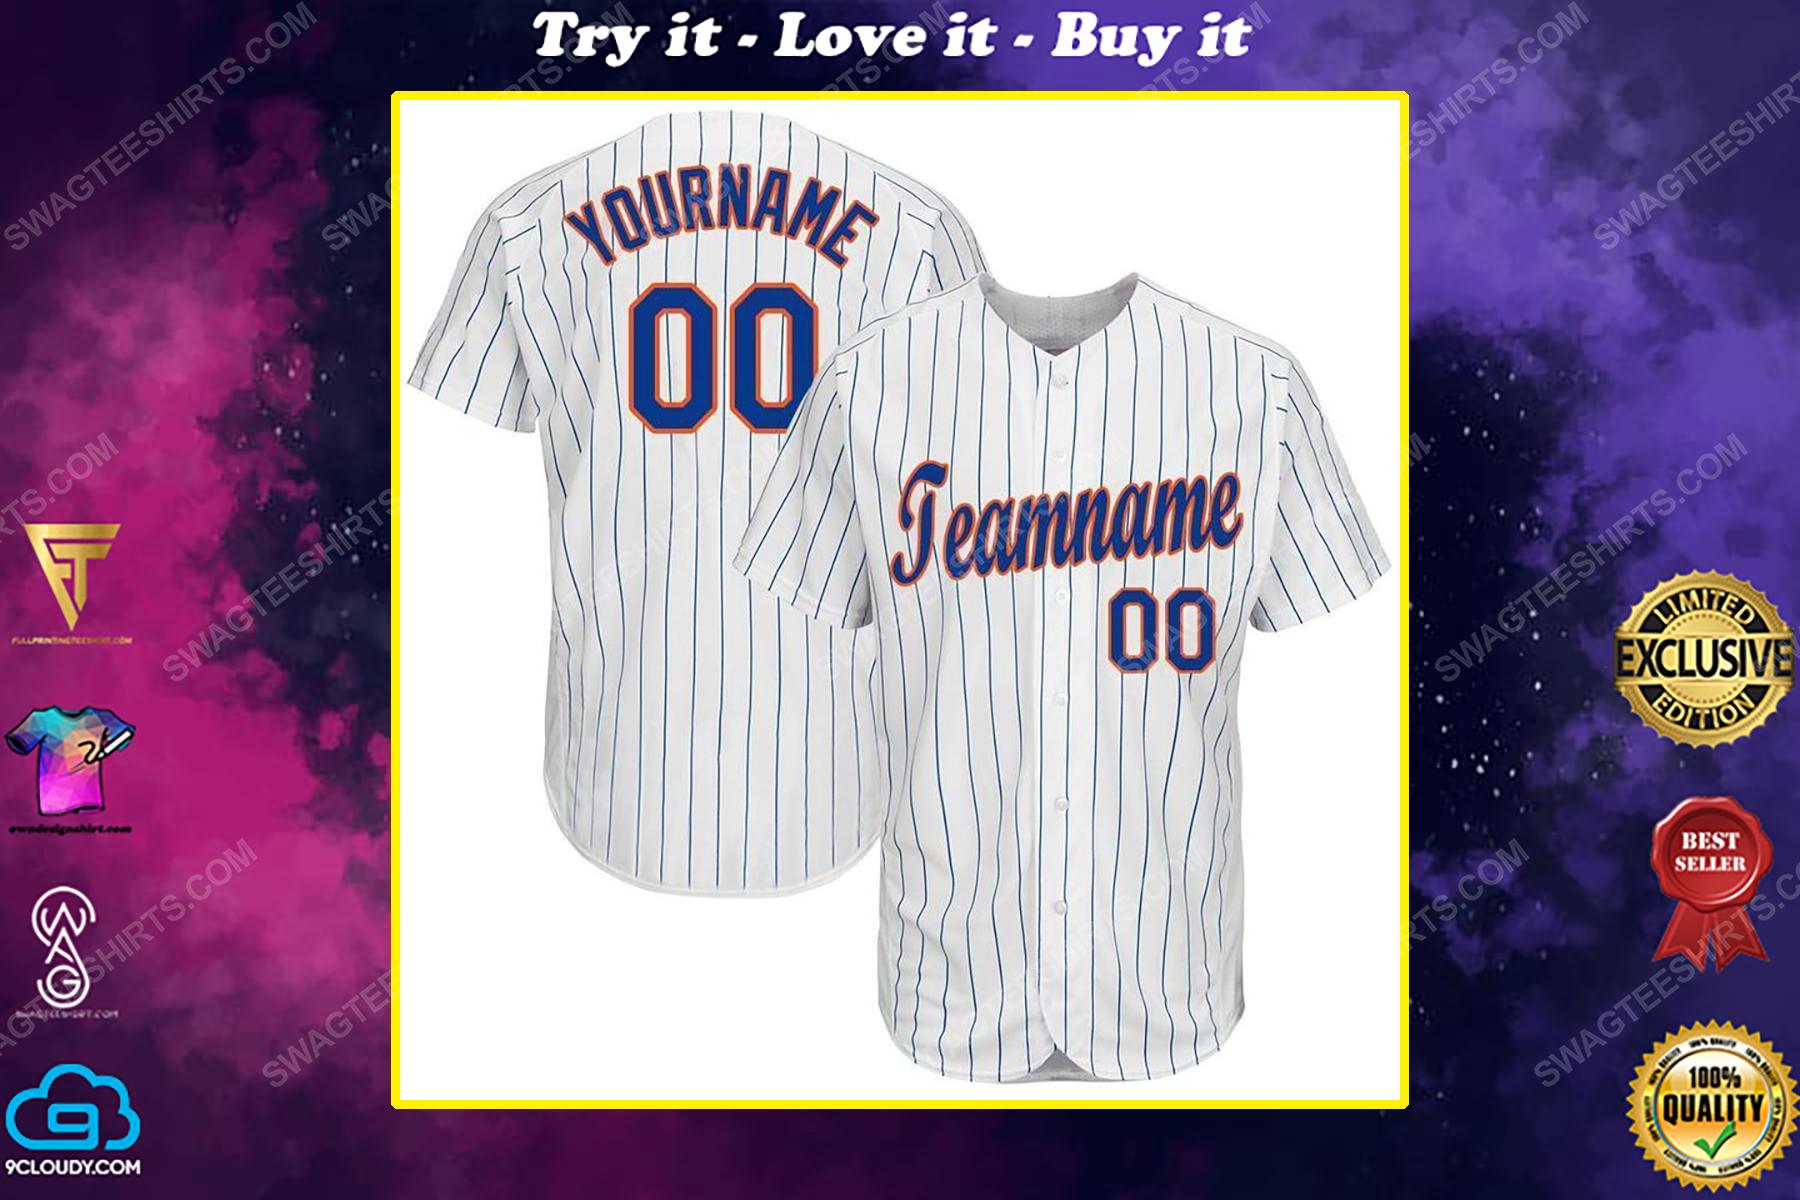 Custom team name mlb new york yankees full printed baseball jersey